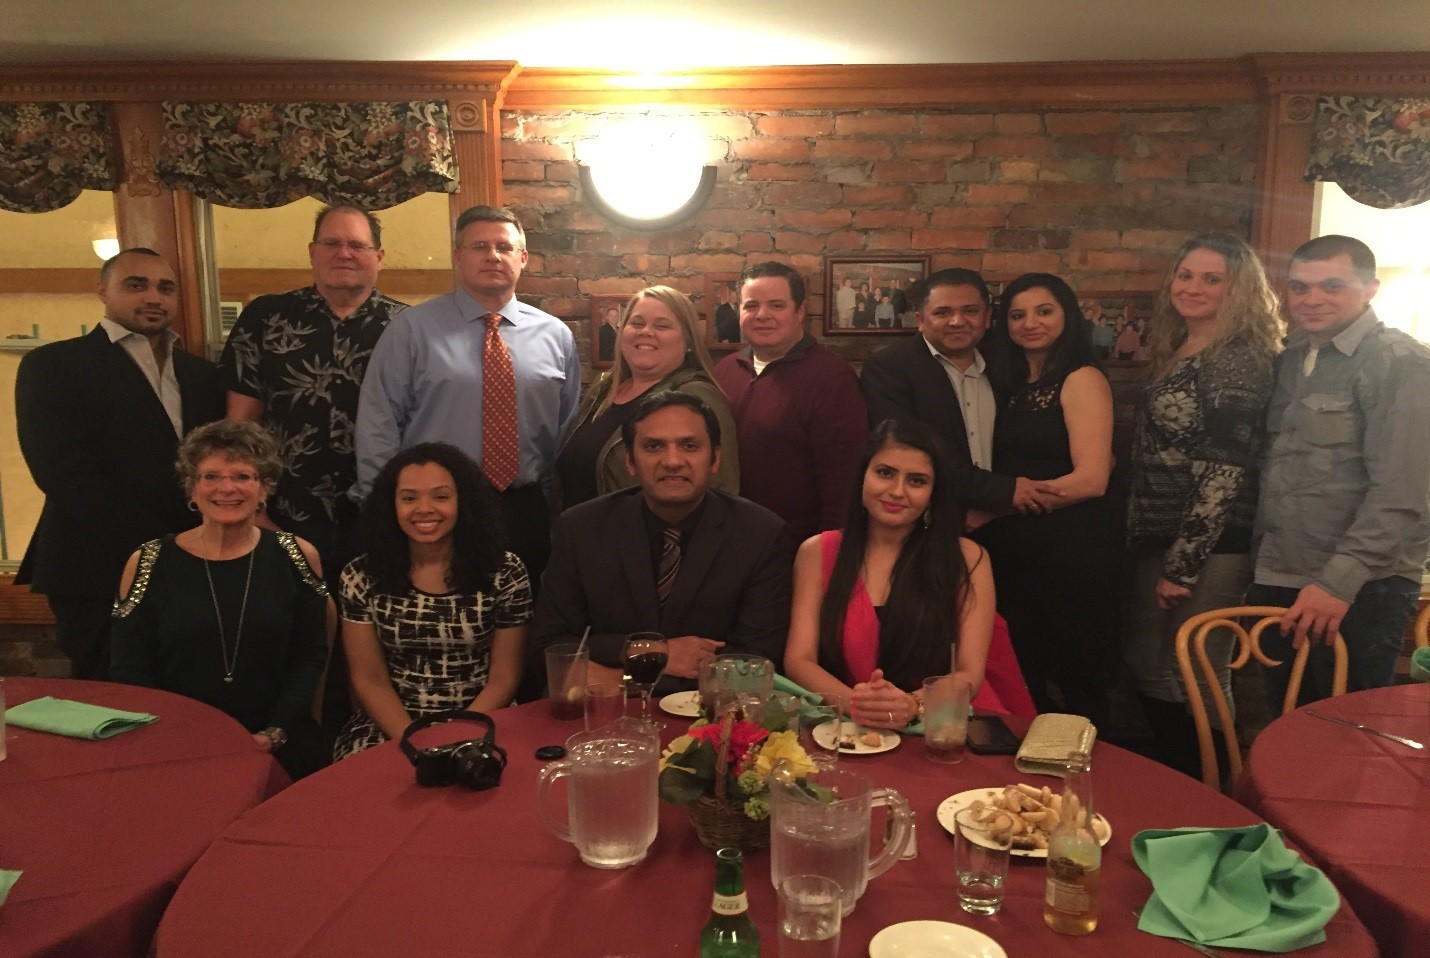 Atlantic City ActioNeters enjoyed celebrating holiday party together